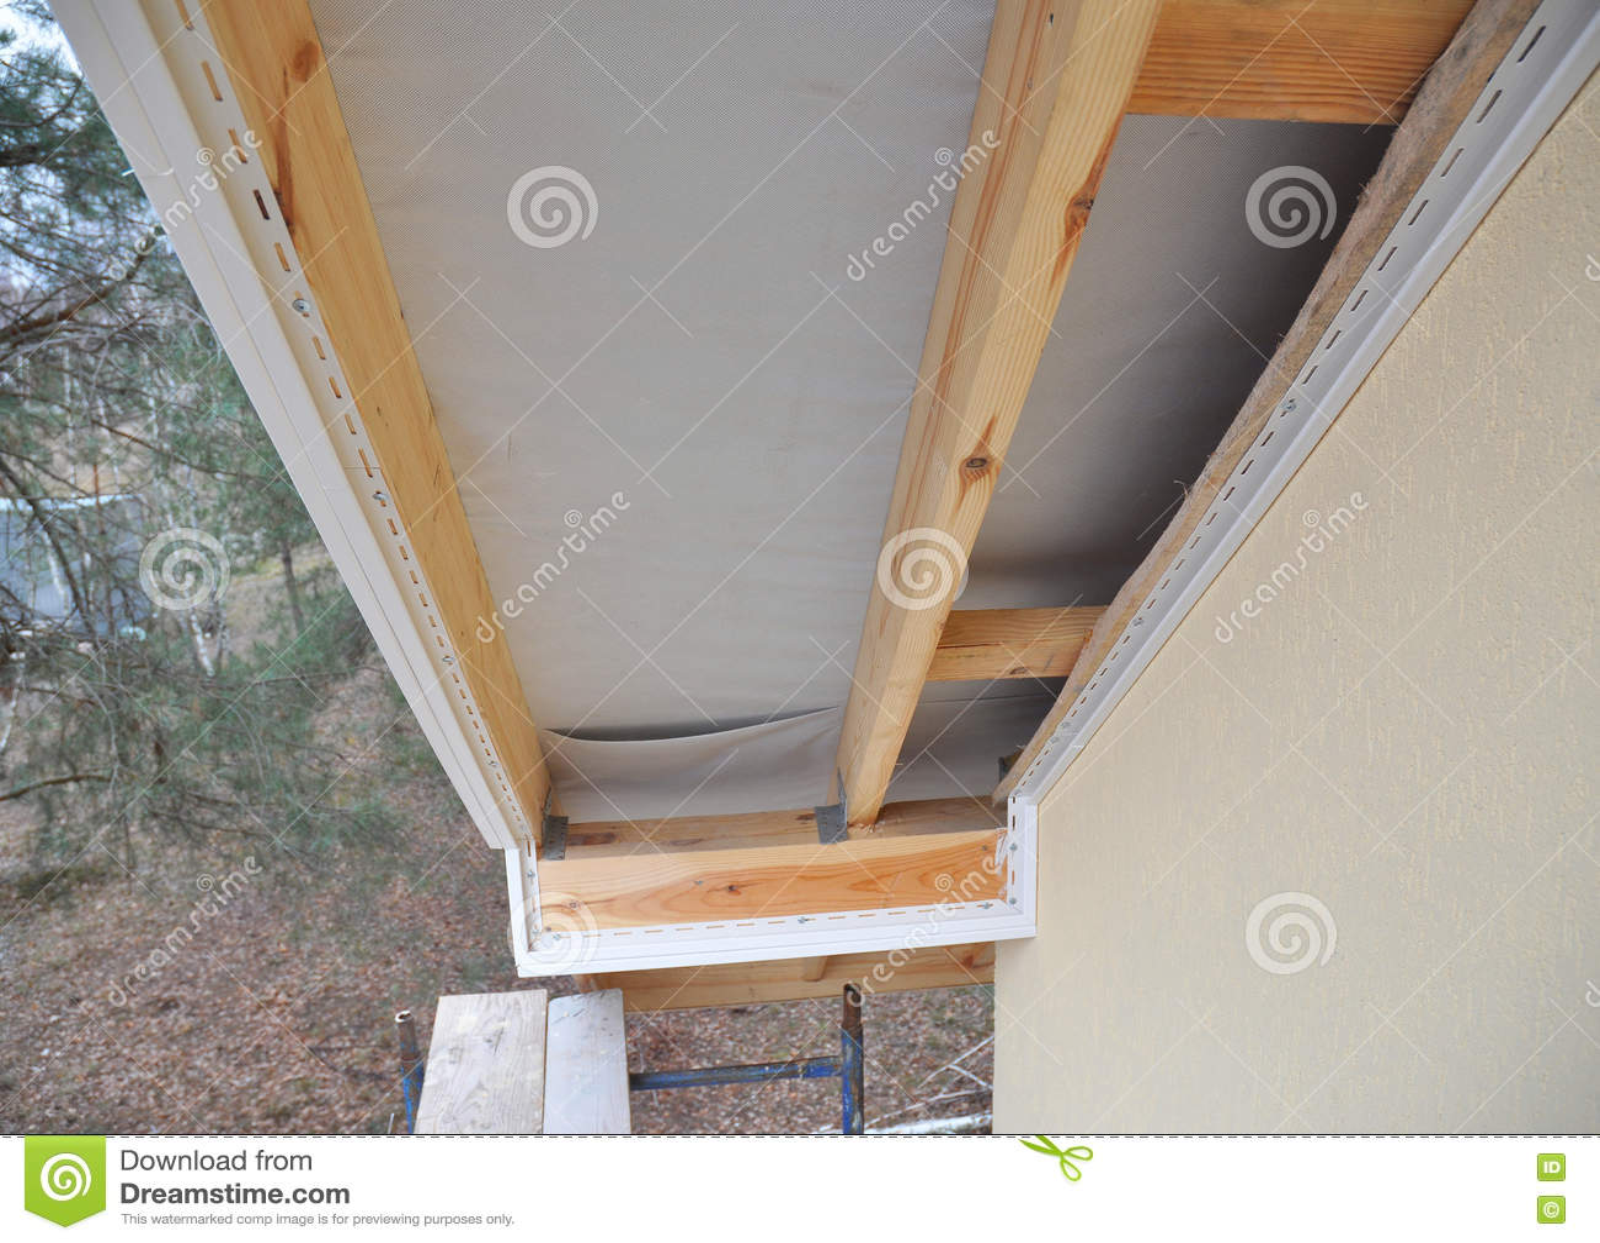 Wood Aluminum Composite Round Oval Window Stock Photo